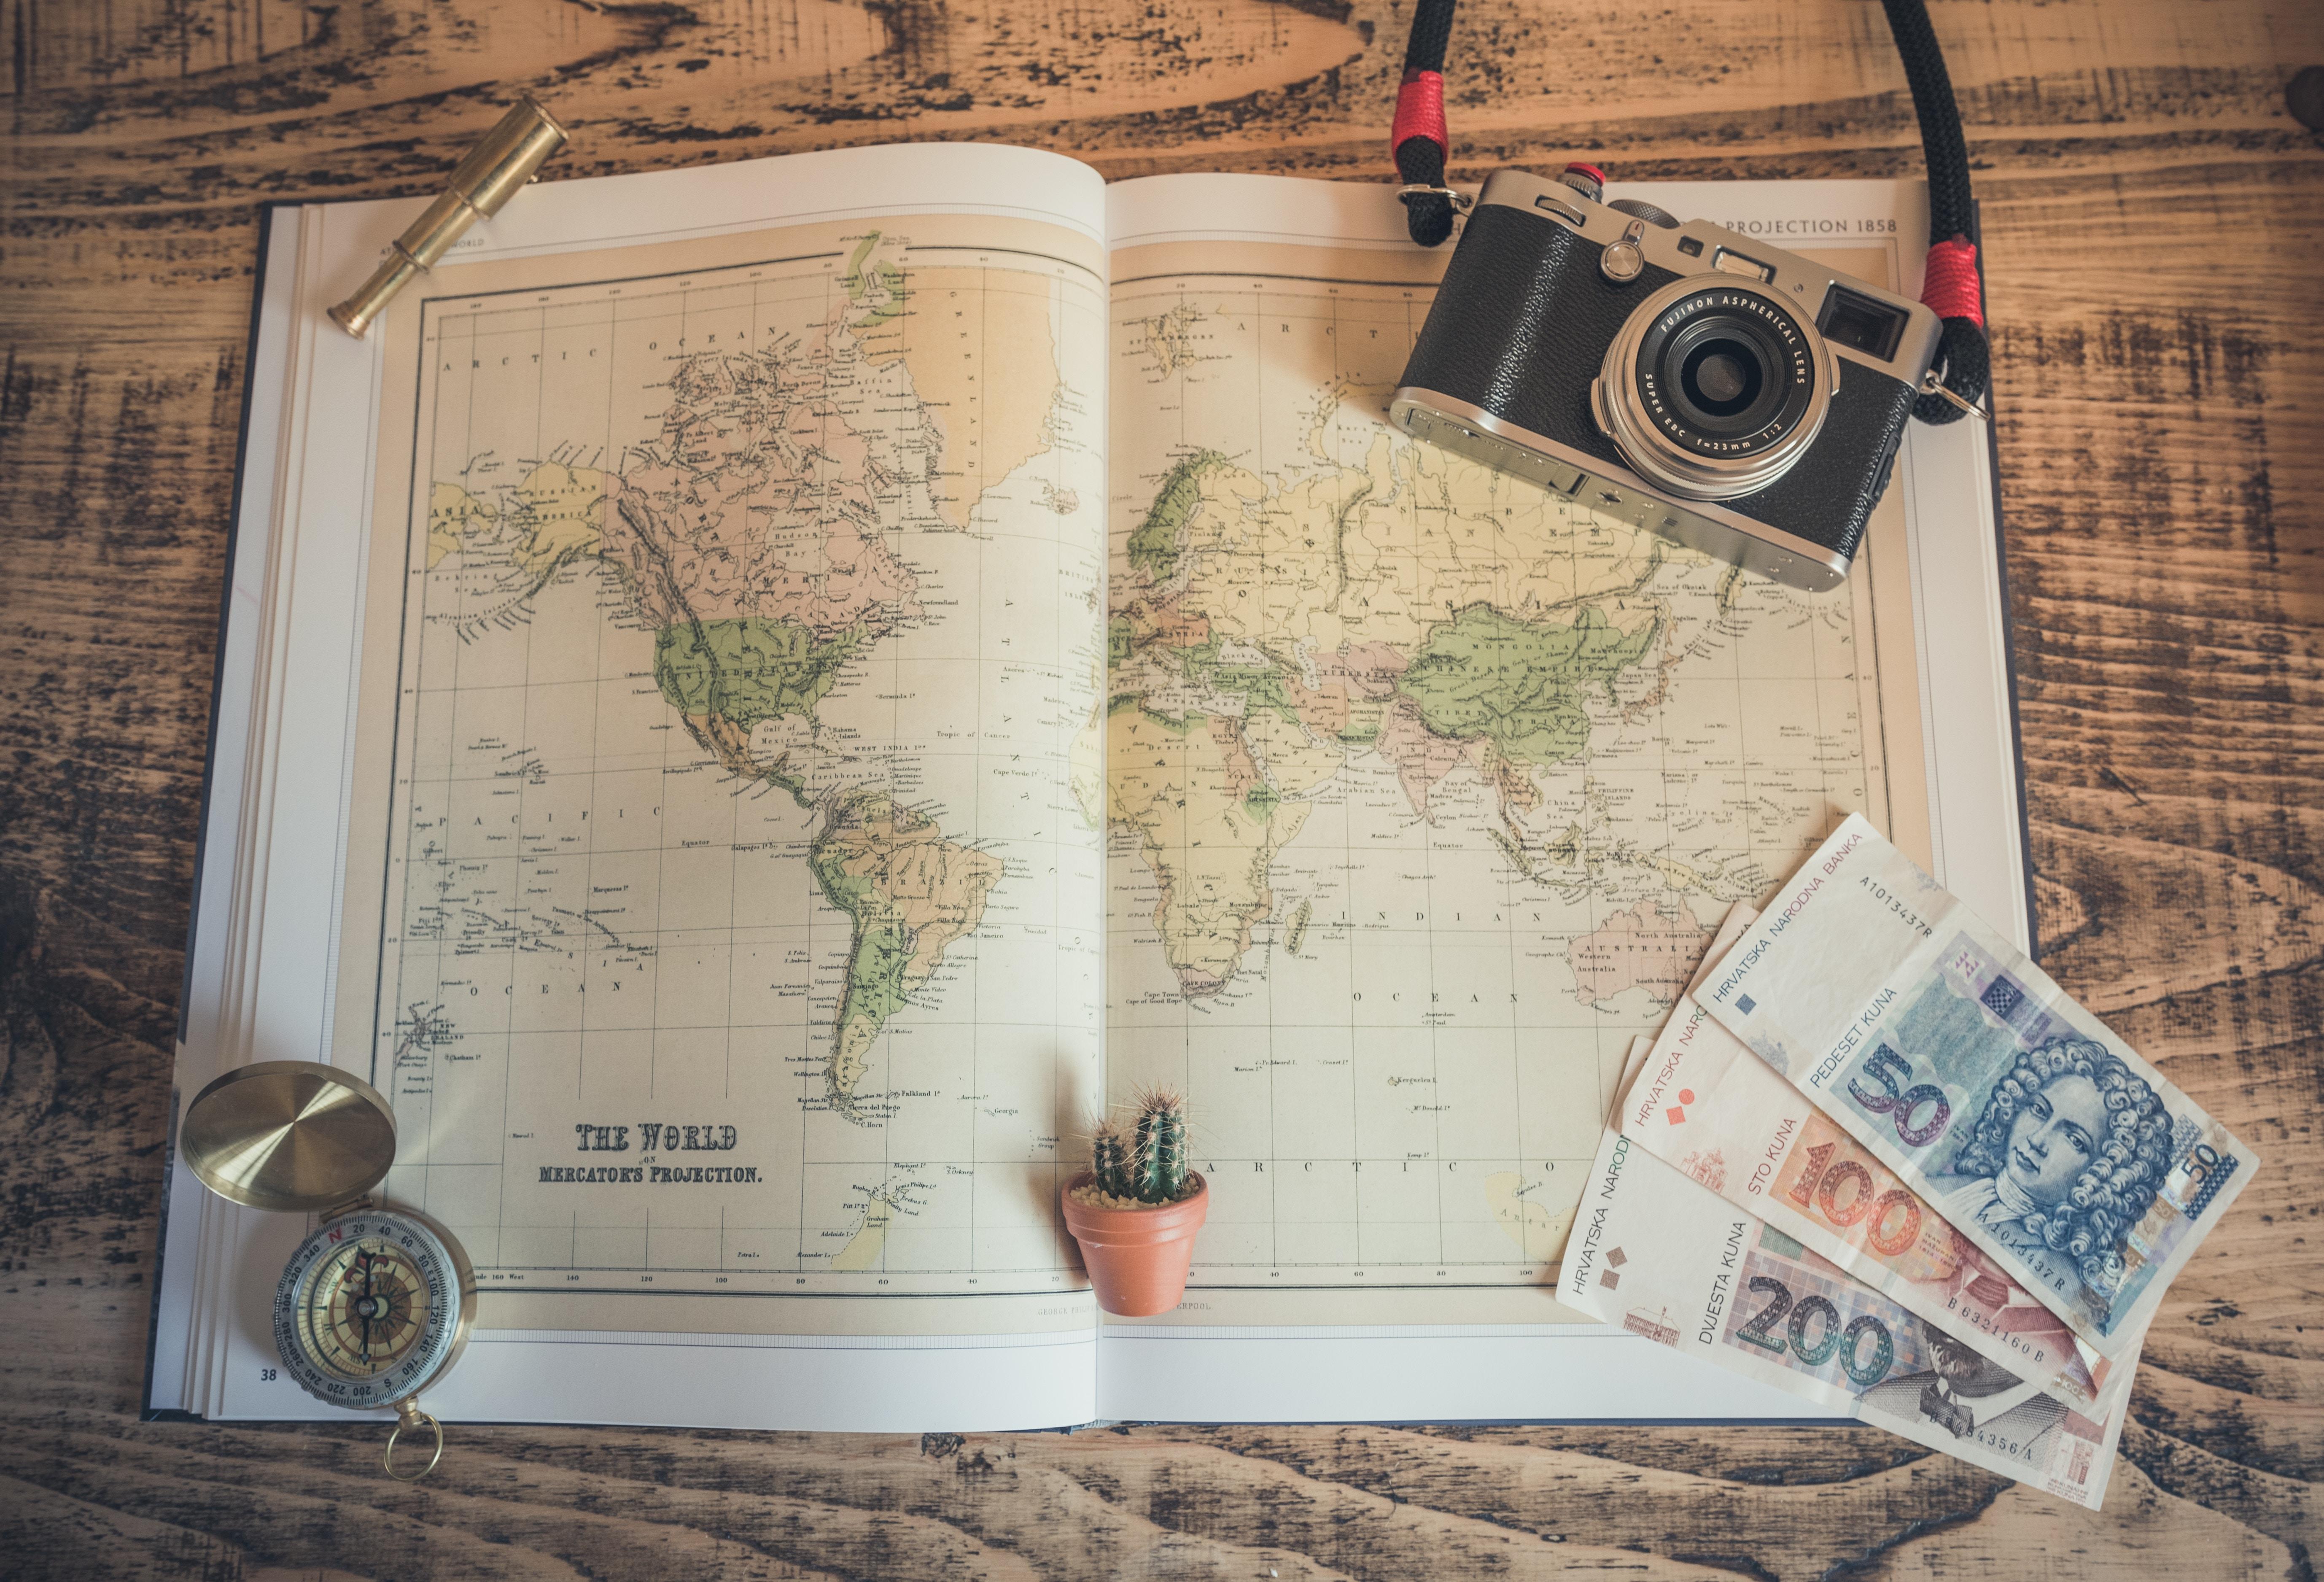 Plan A Road Trip >> Real World Math The Algebra Of Planning A Road Trip Askdrcallahan